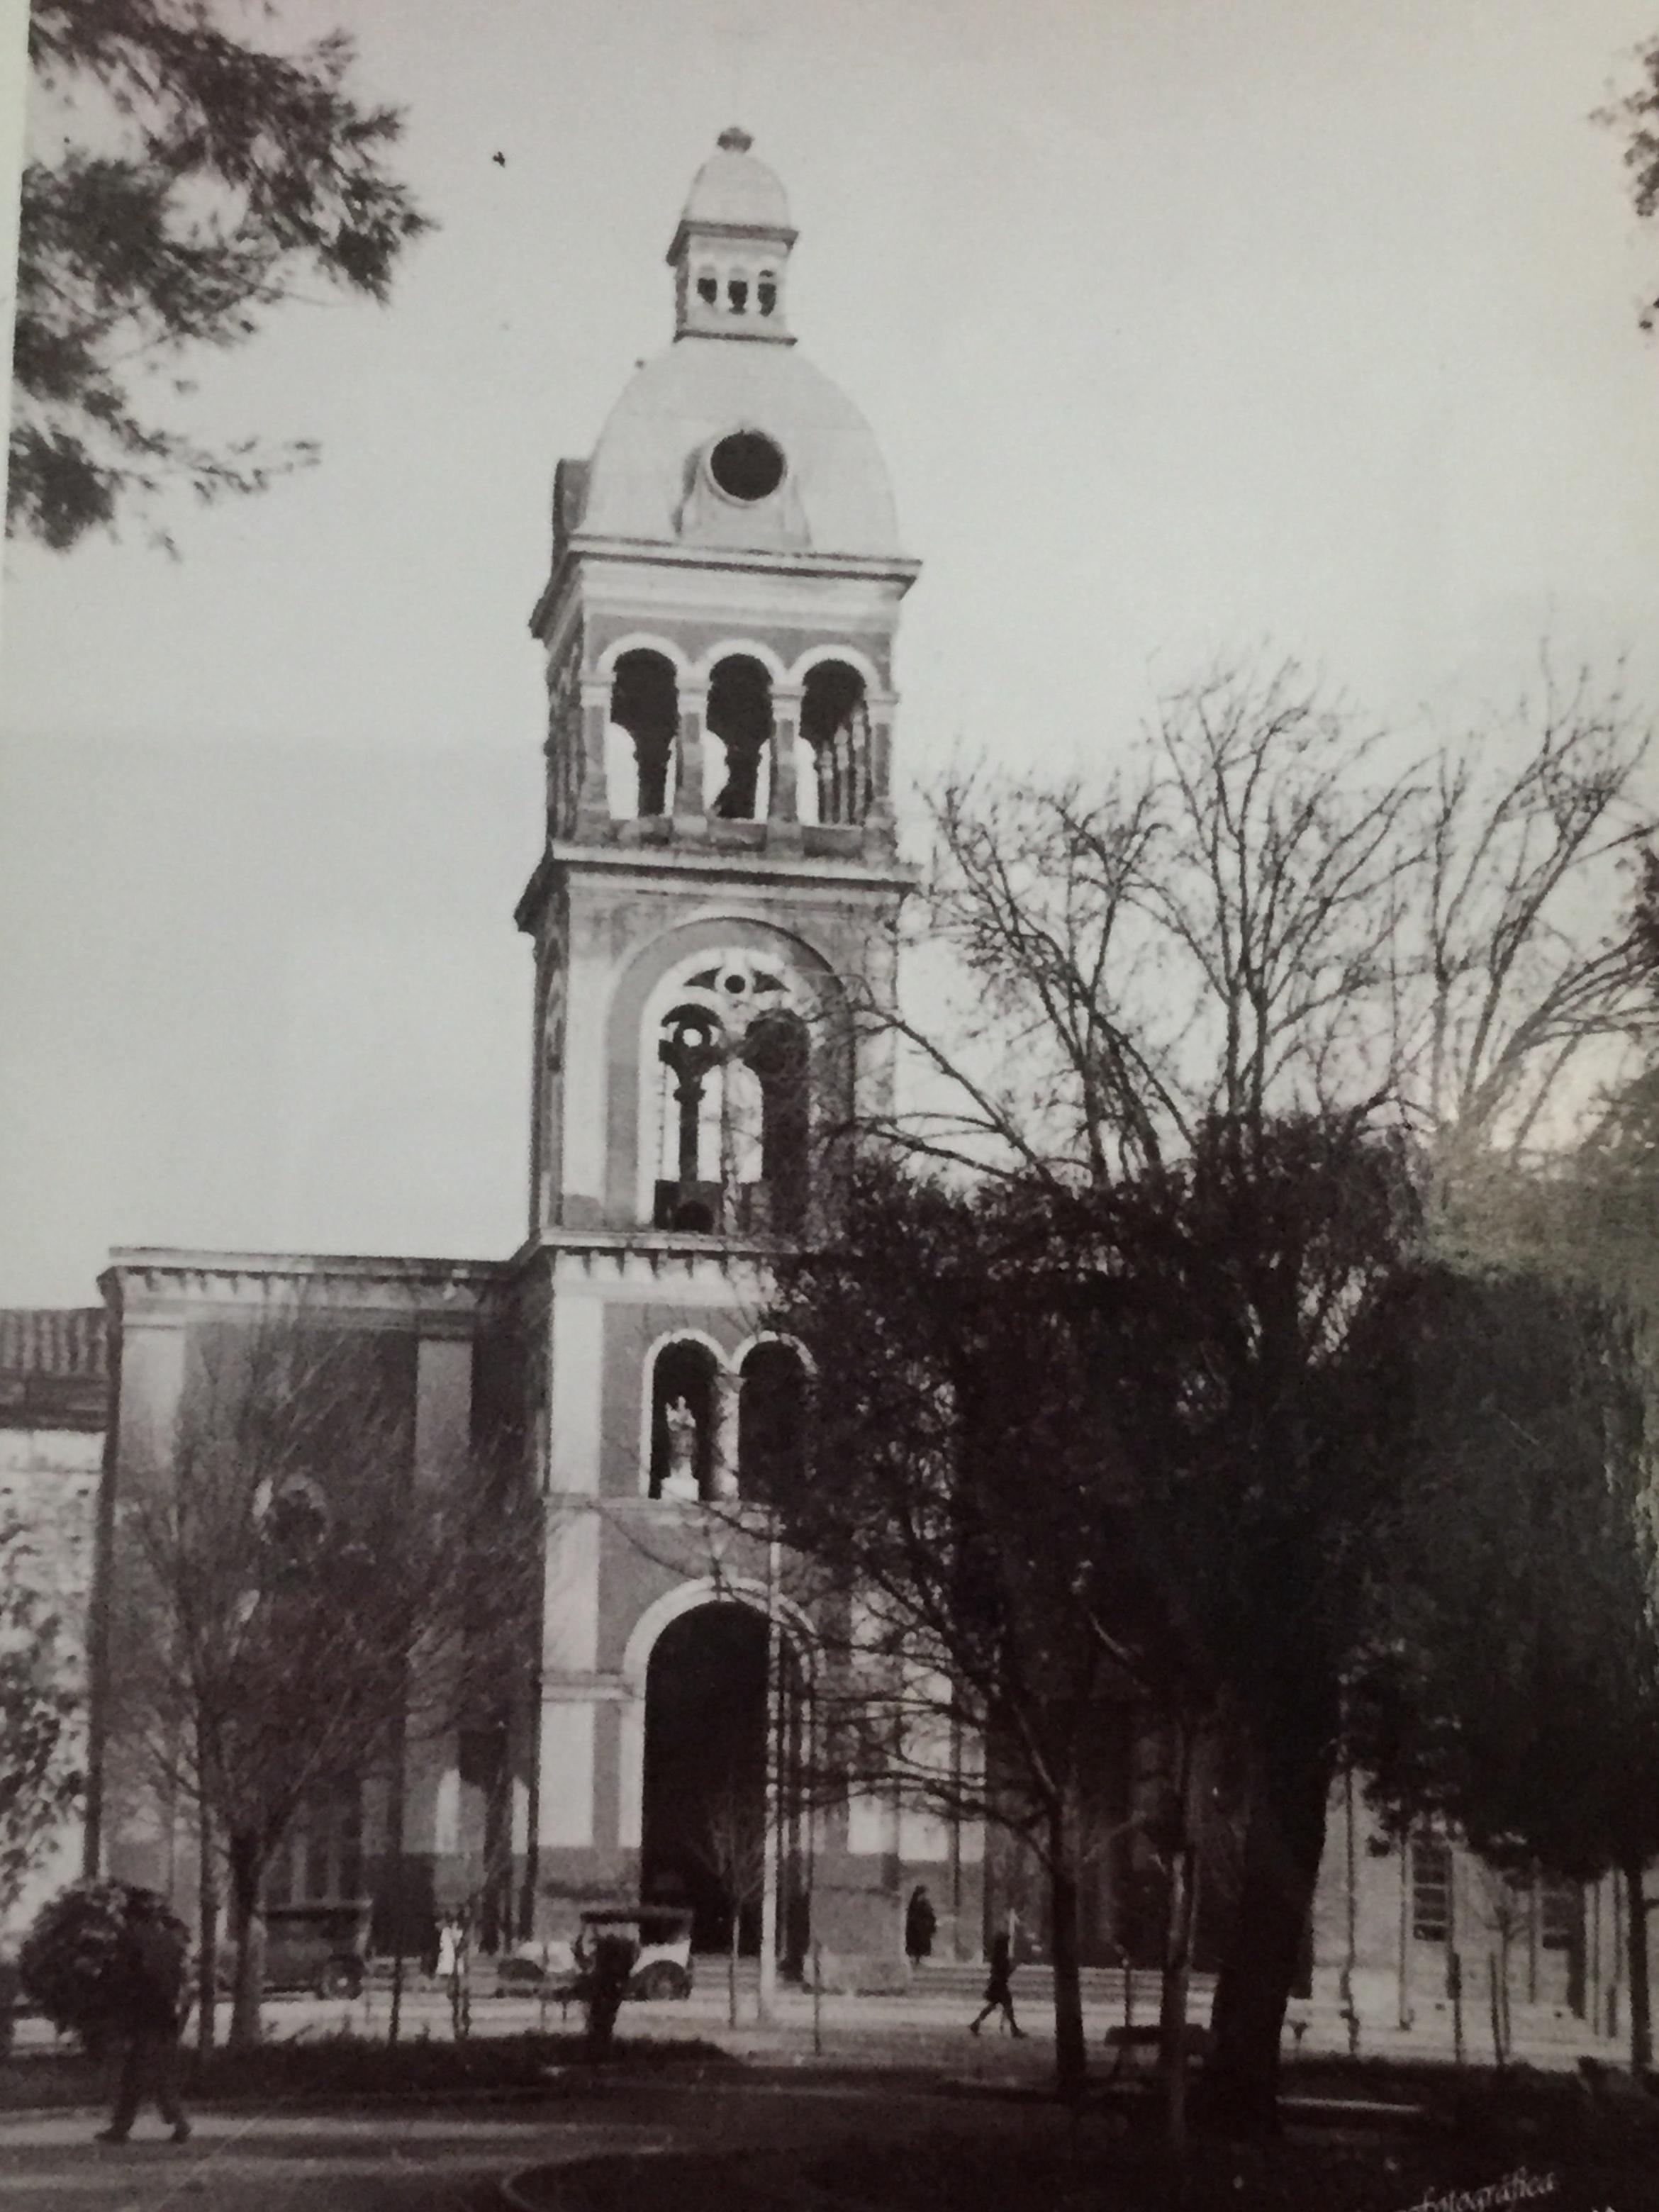 Enterreno - Fotos históricas de chile - fotos antiguas de Chile - Iglesia de Santo Domingo Cauquenes, 1925